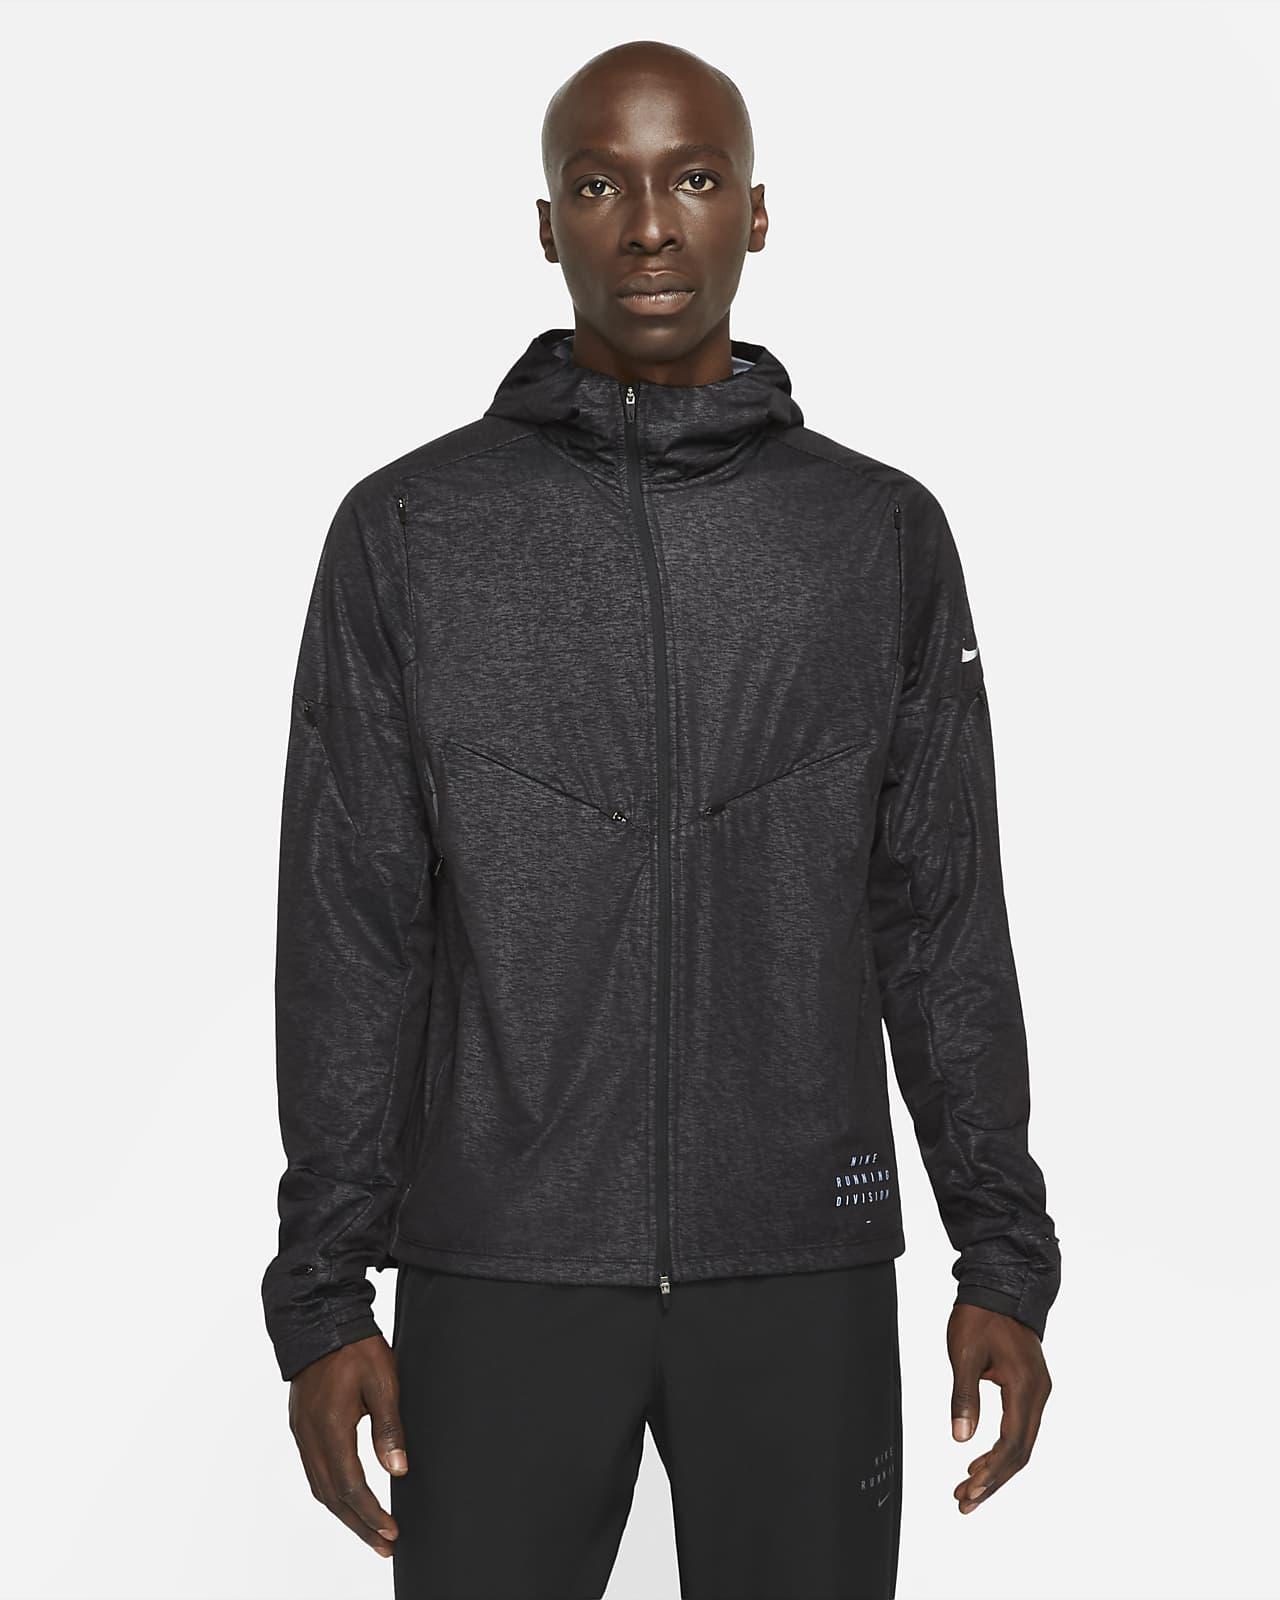 Nike Pinnacle Run Division Men's Printed Running Jacket